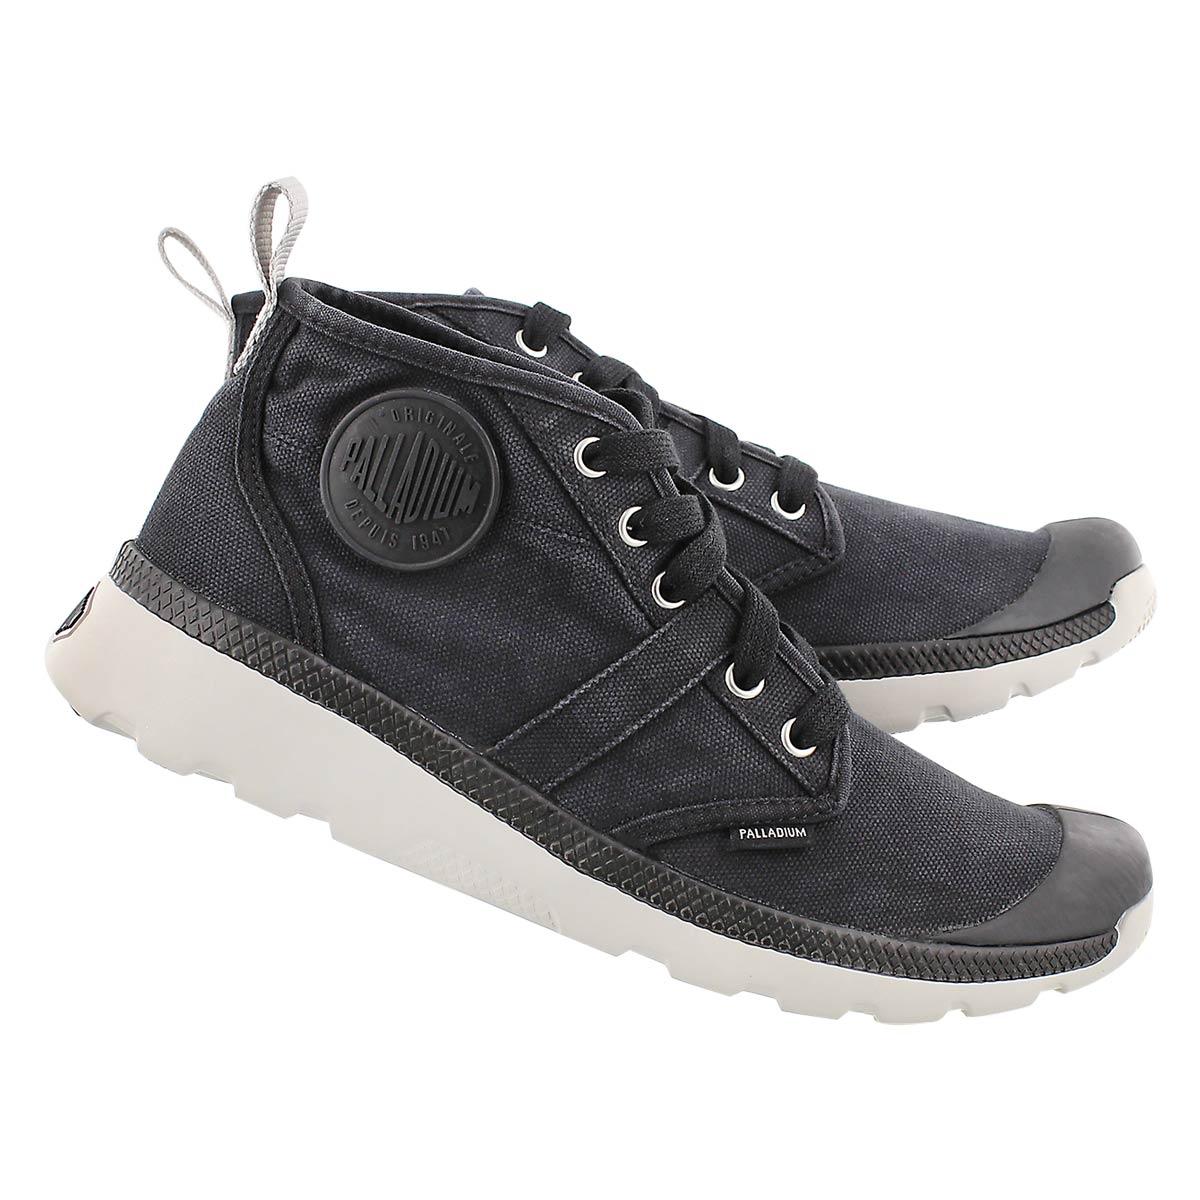 Mns Pallaville Hi blk/wnd chme sneaker